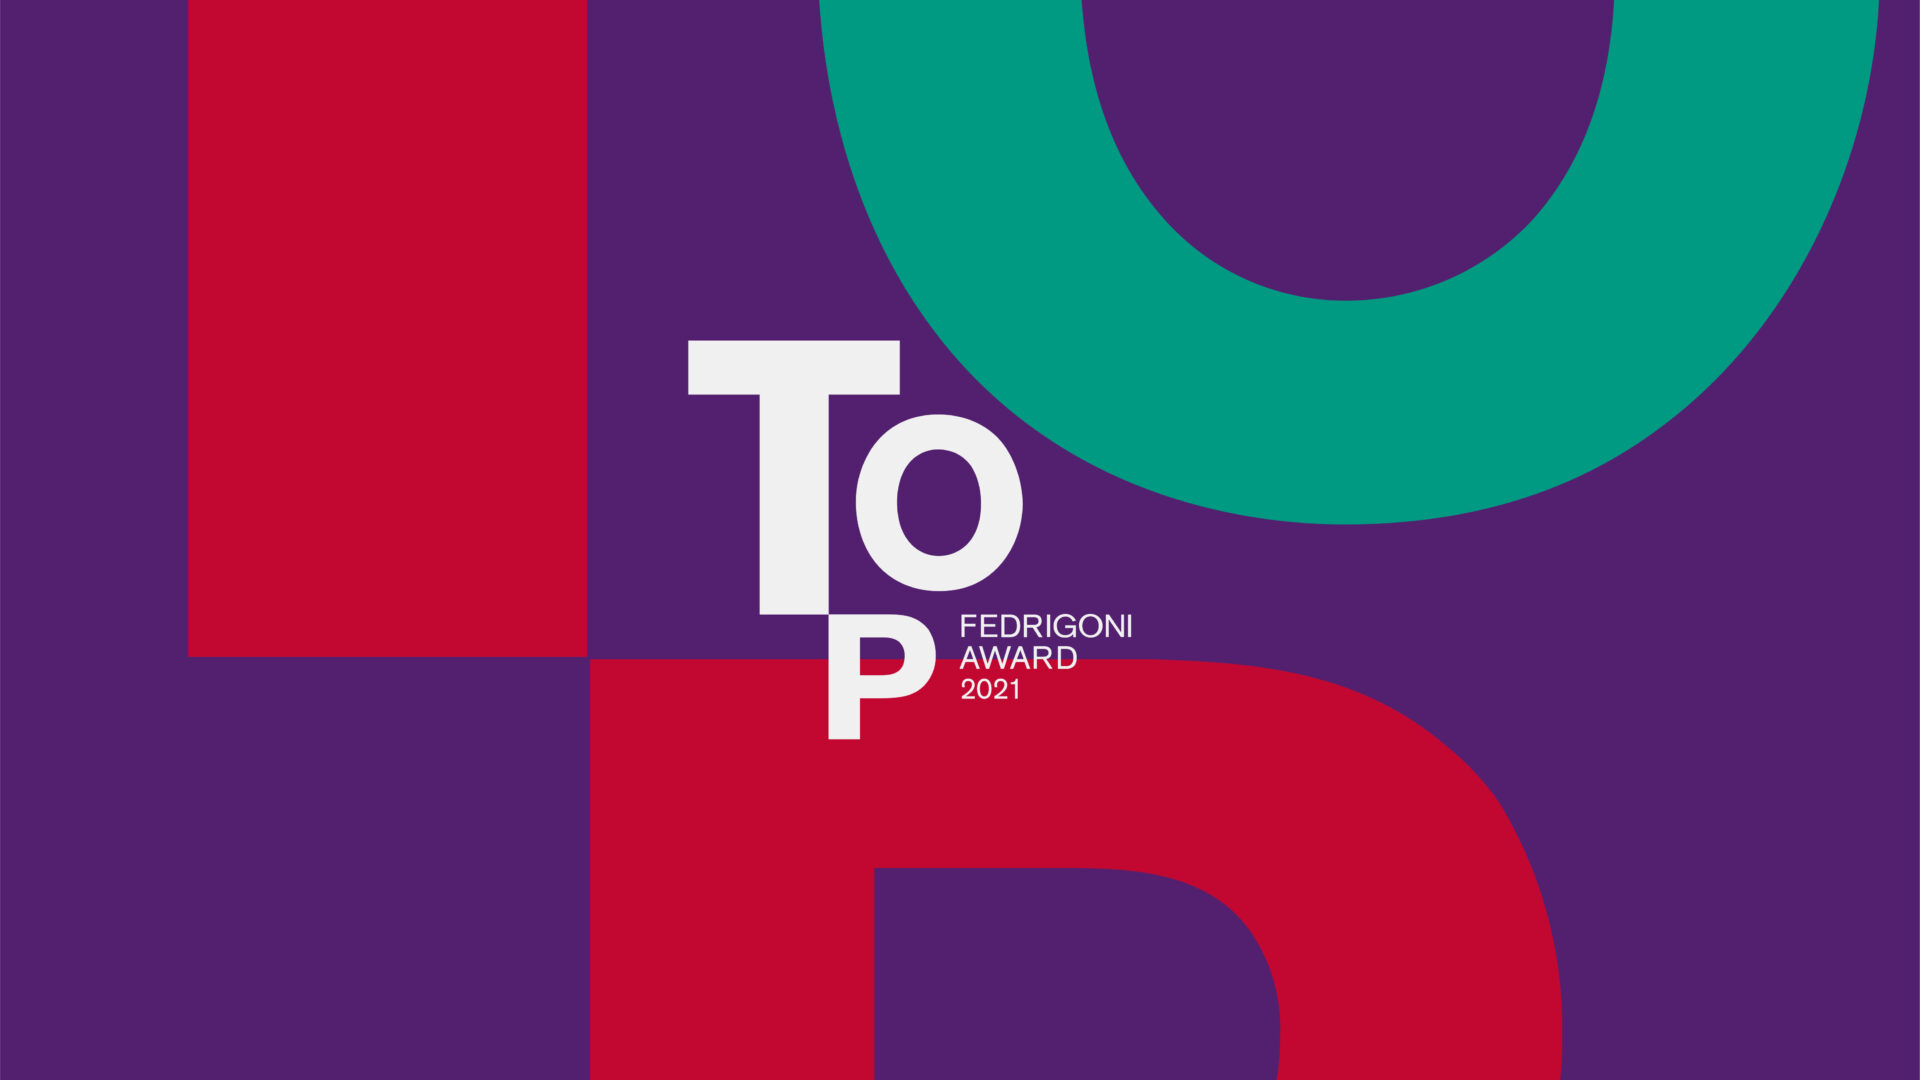 Fedrigoni Top Award 2021: Digital Experience